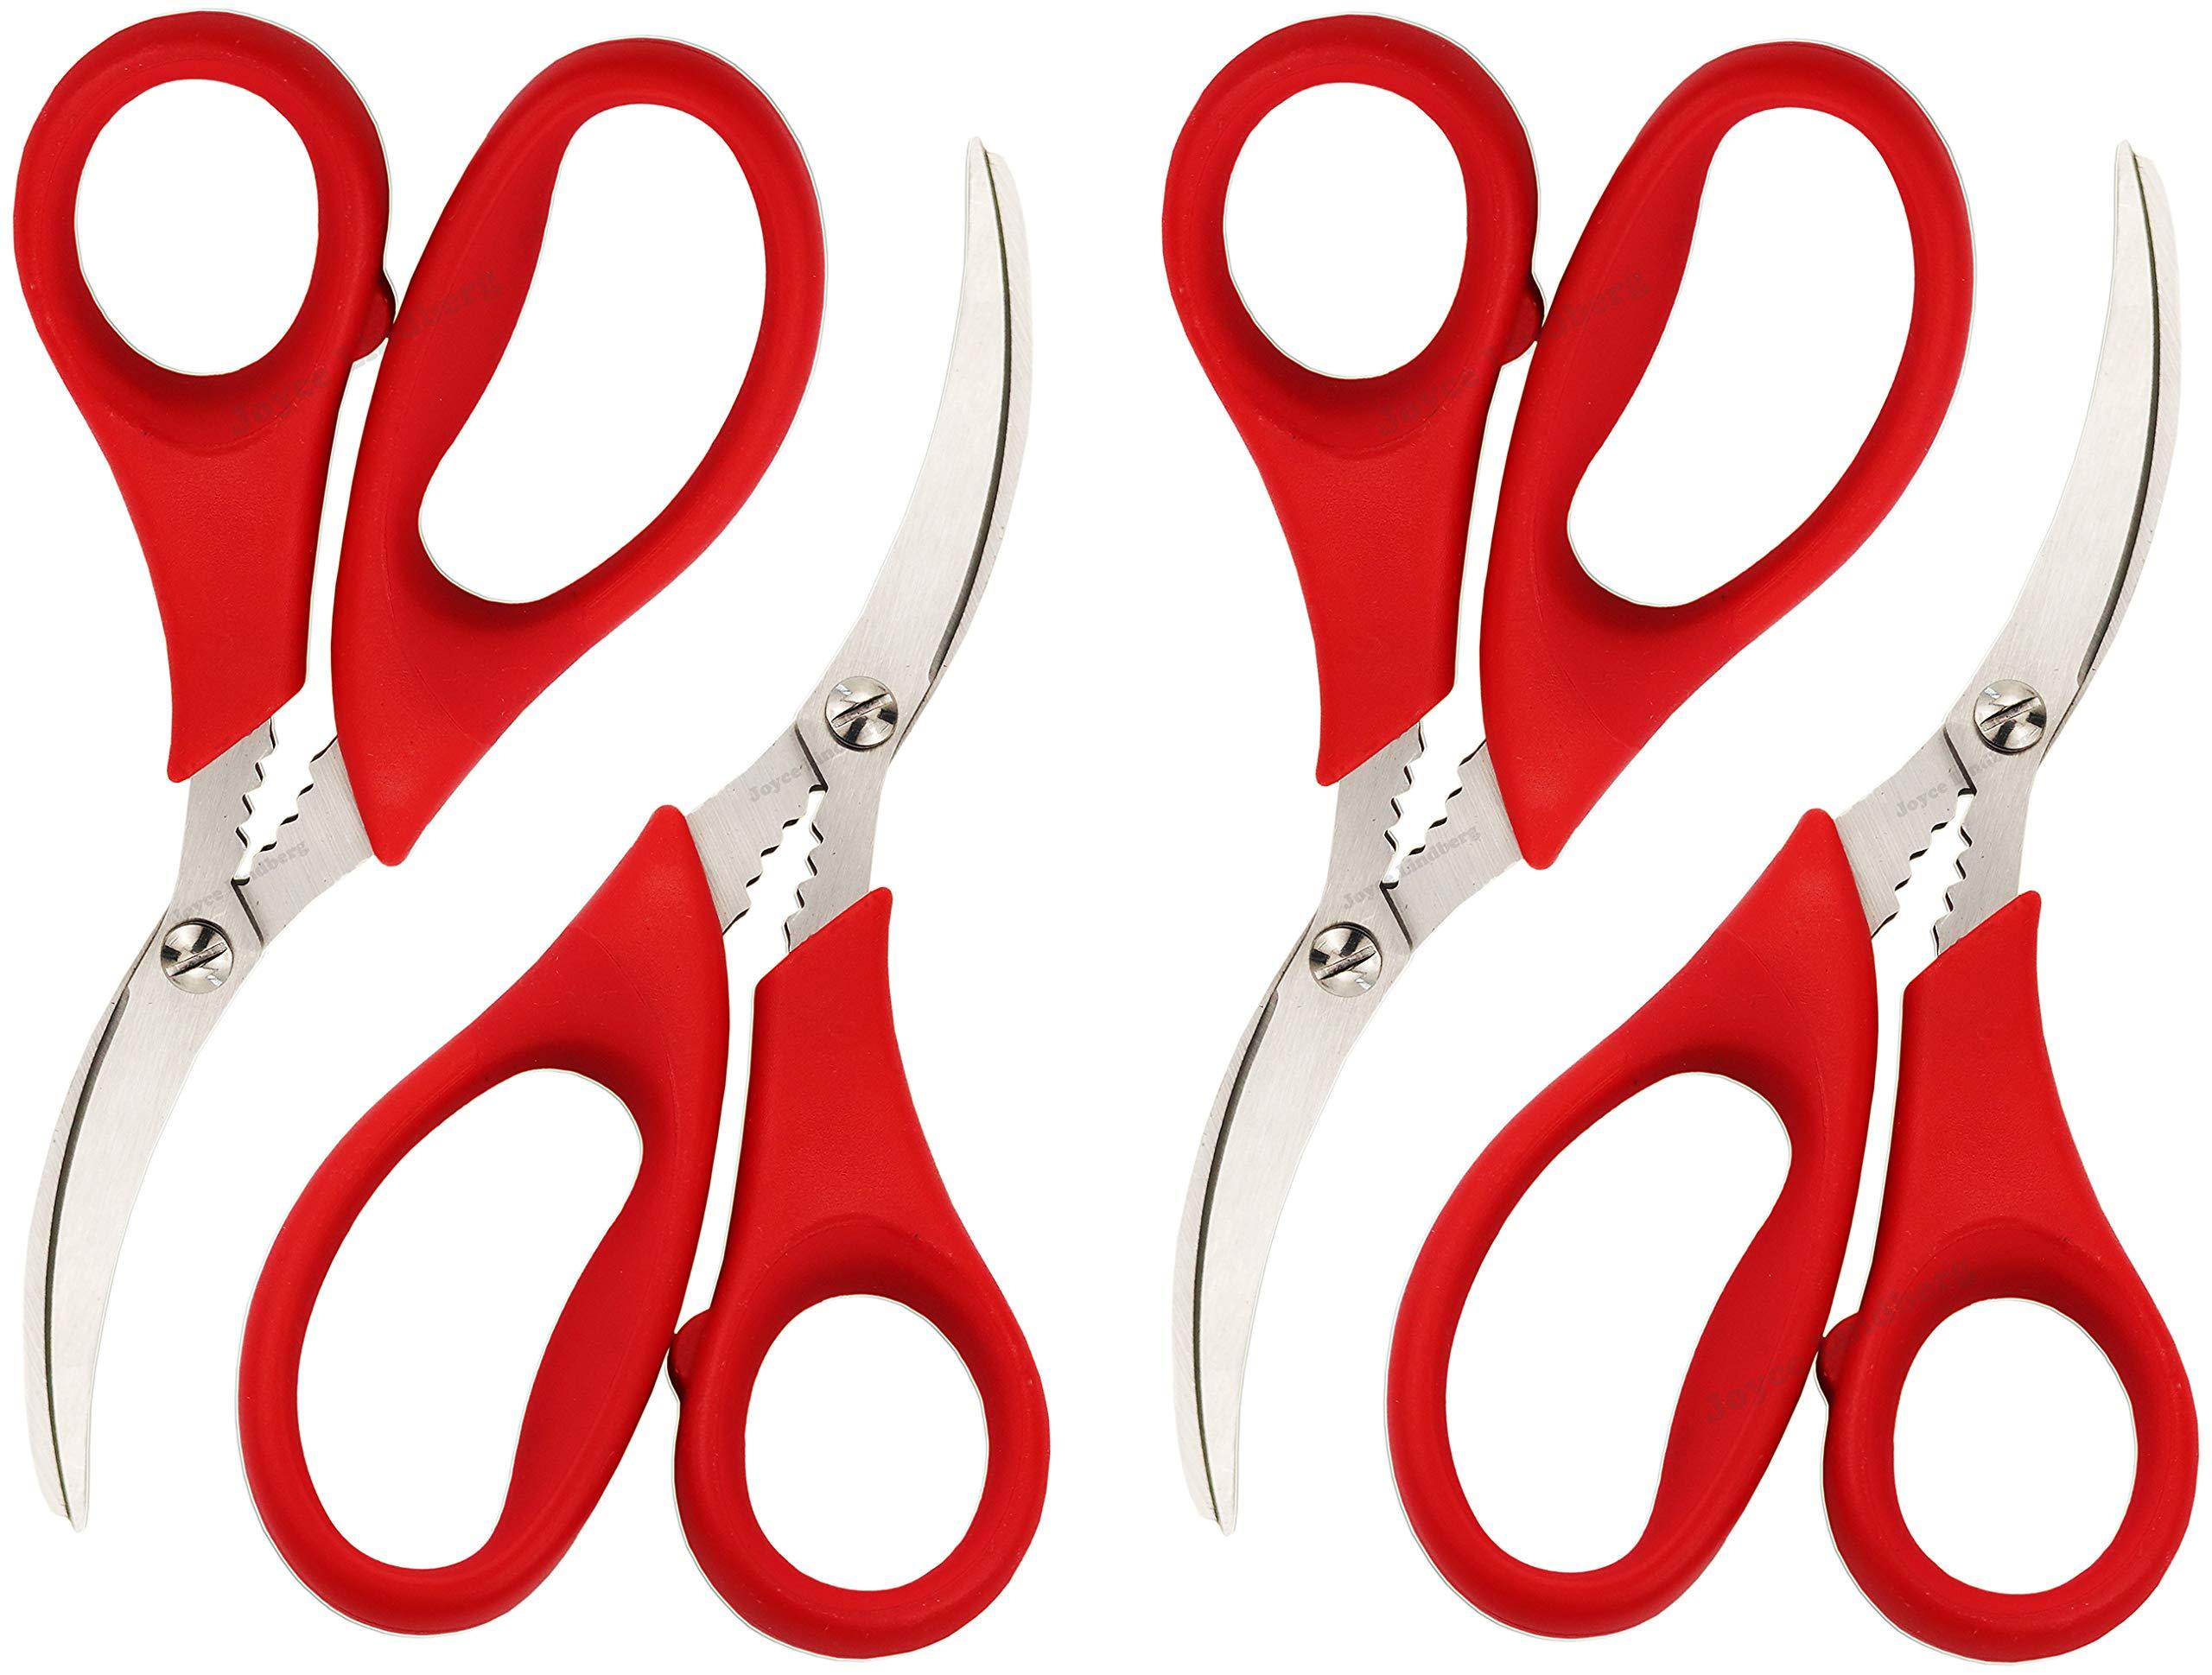 Joyce Lindberg Seafood Scissors for Kitchen Seafood Fish Crab Shrimp Lobster Scissors 4 Pcs by Joyce Lindberg